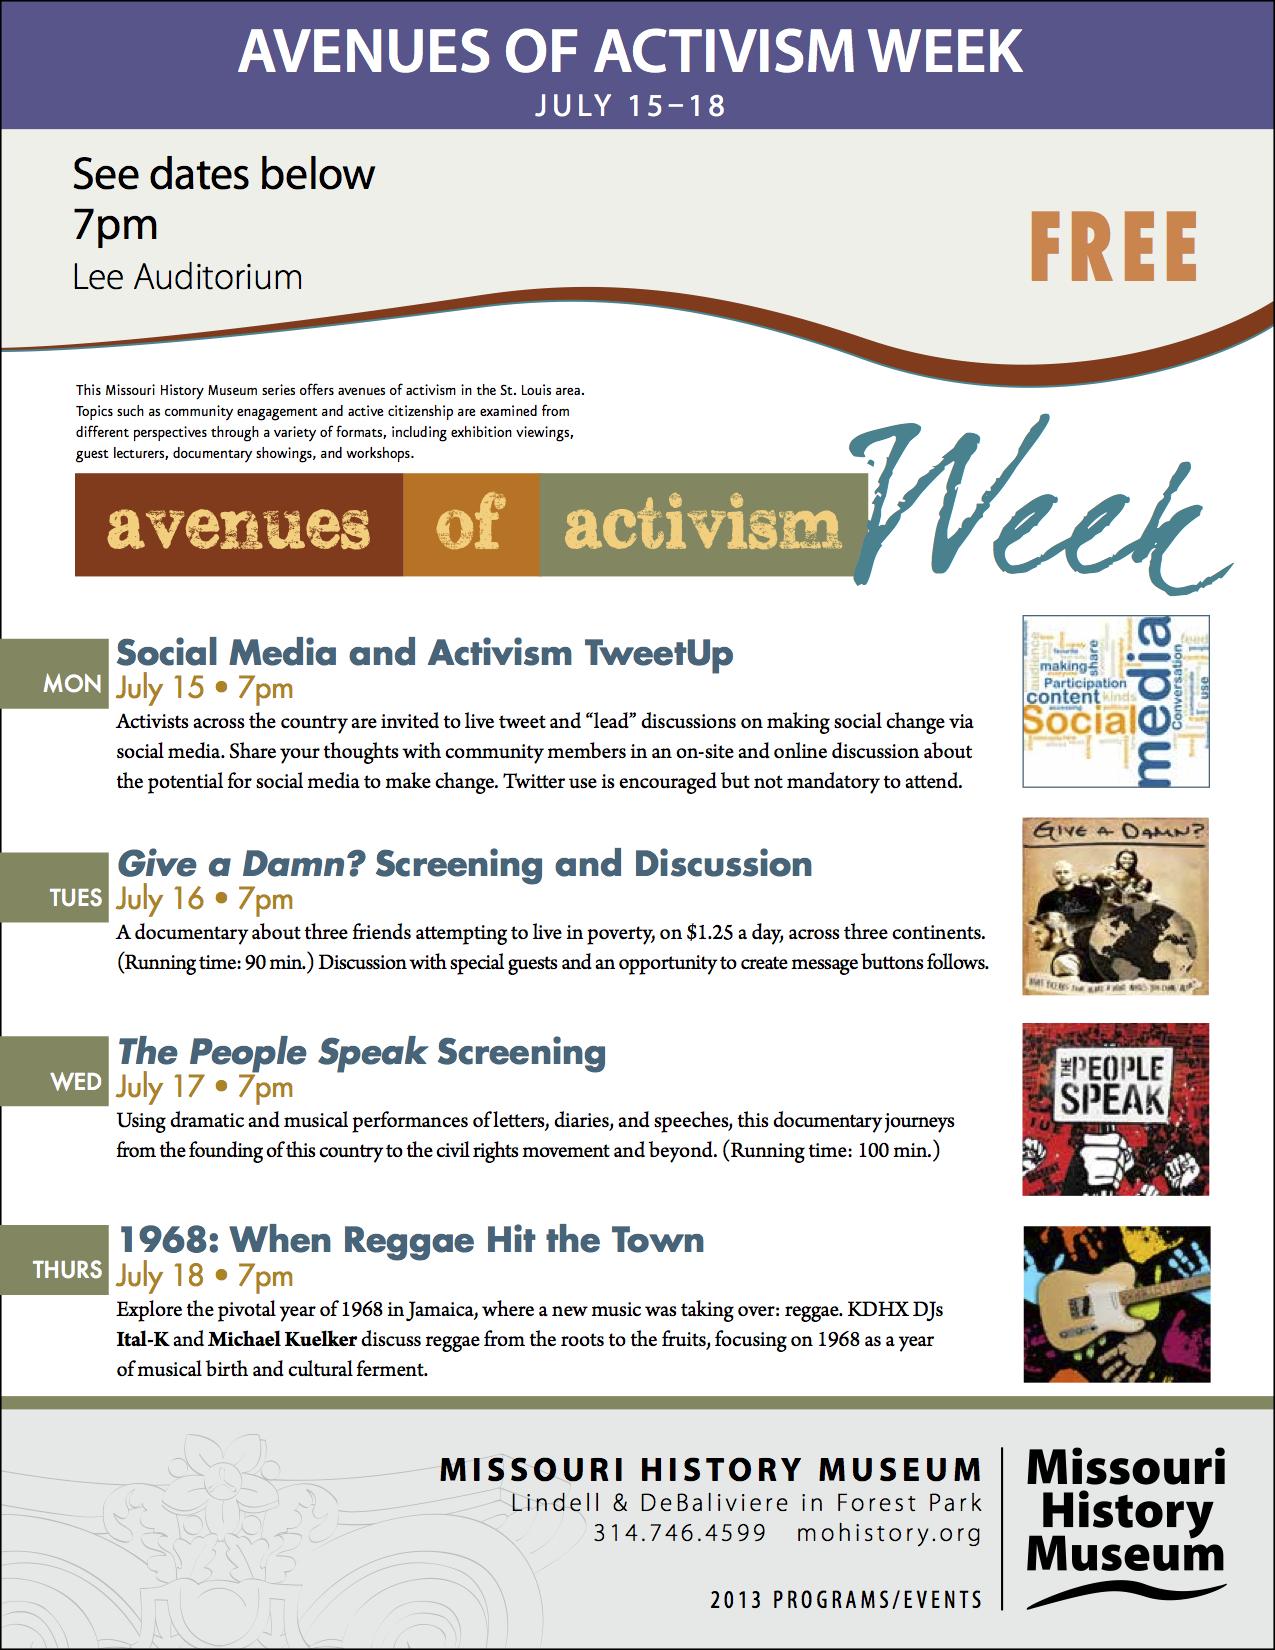 Avenues of Activism Week